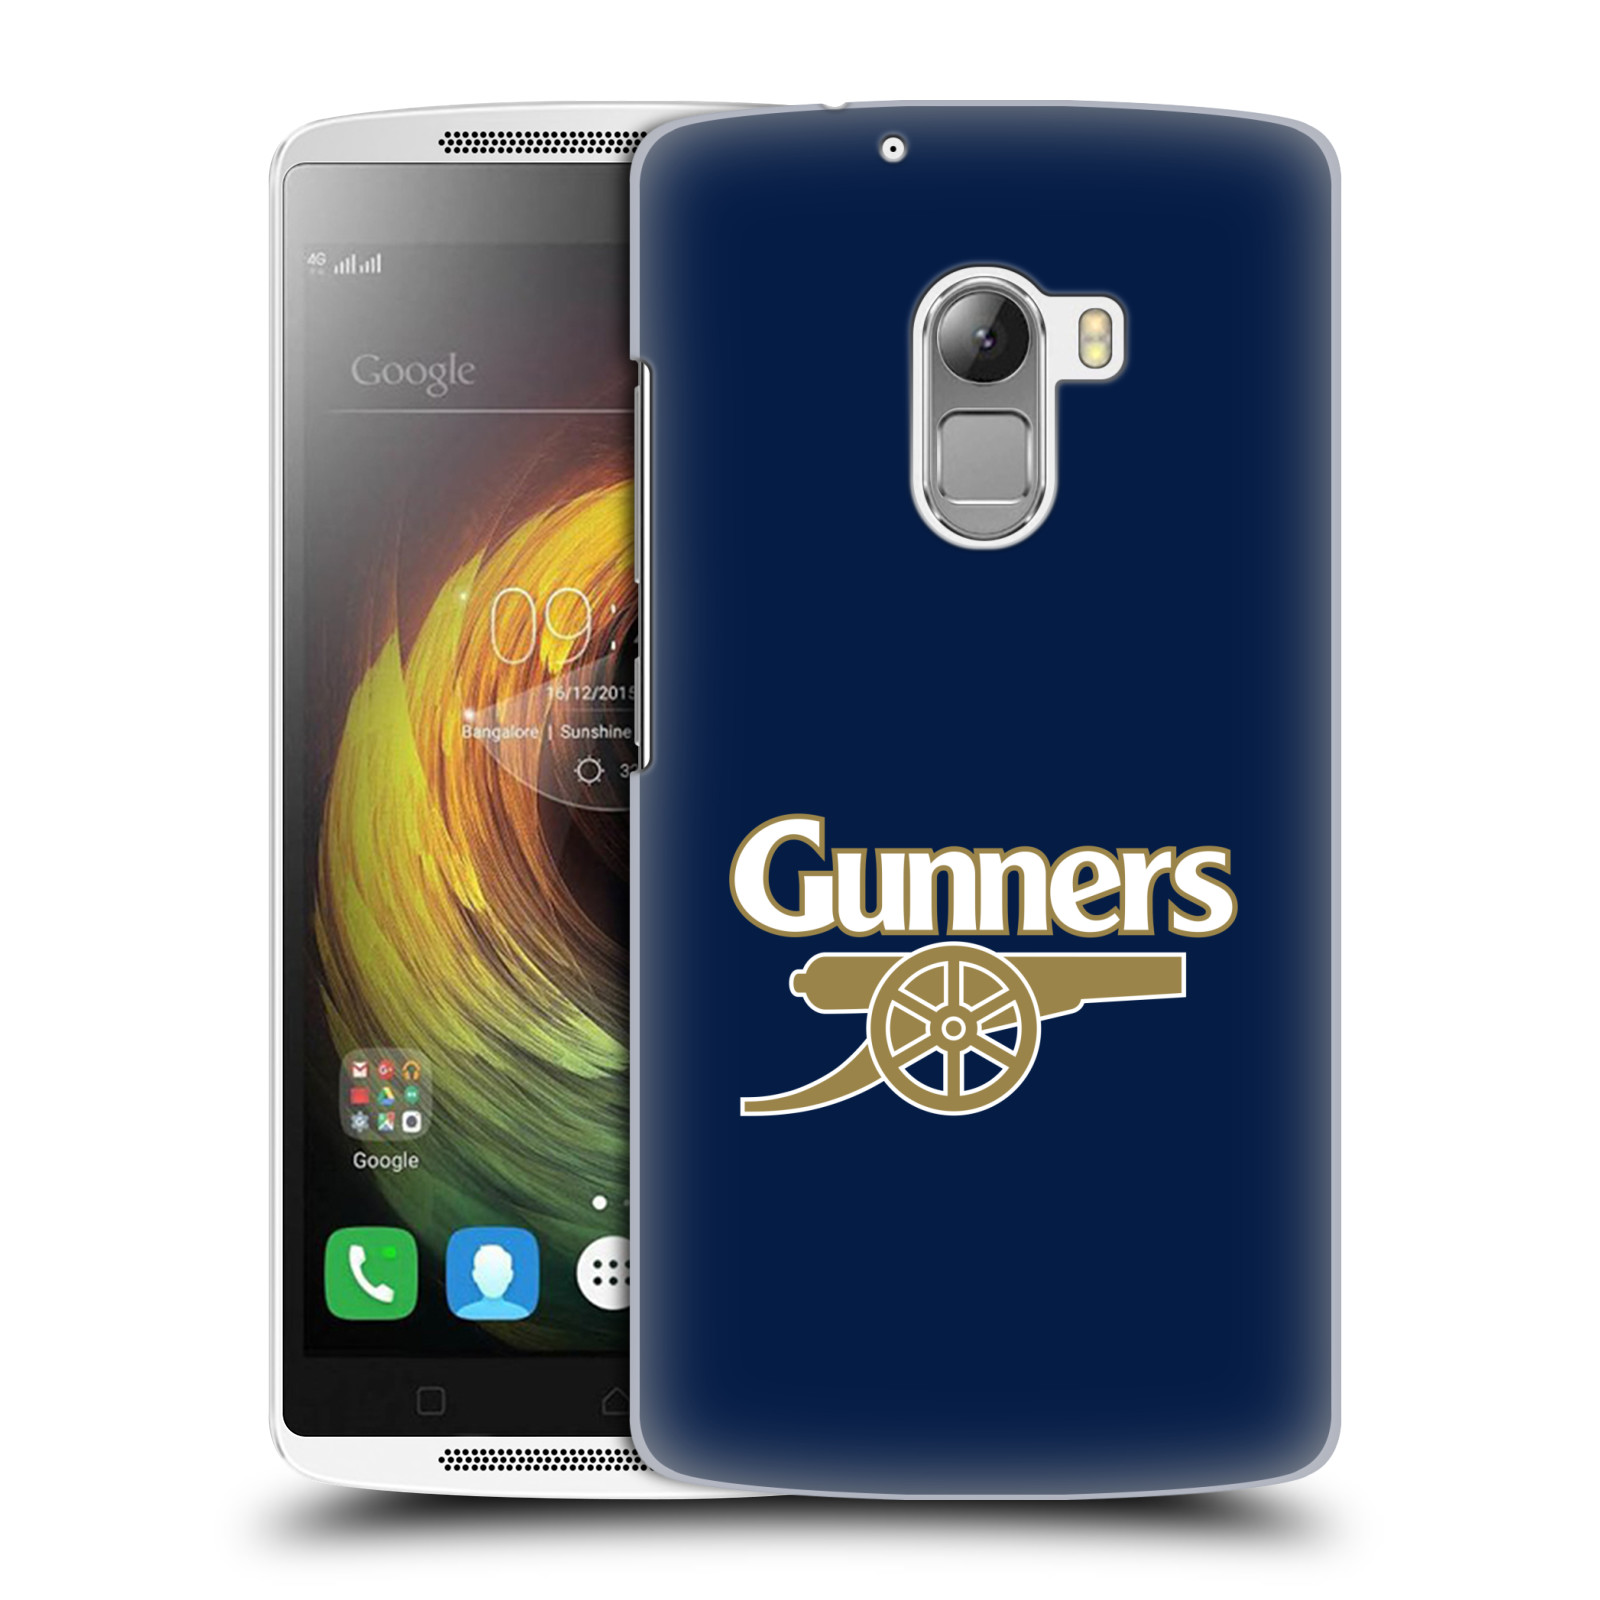 Plastové pouzdro na mobil Lenovo A7010 - Head Case - Arsenal FC - Gunners